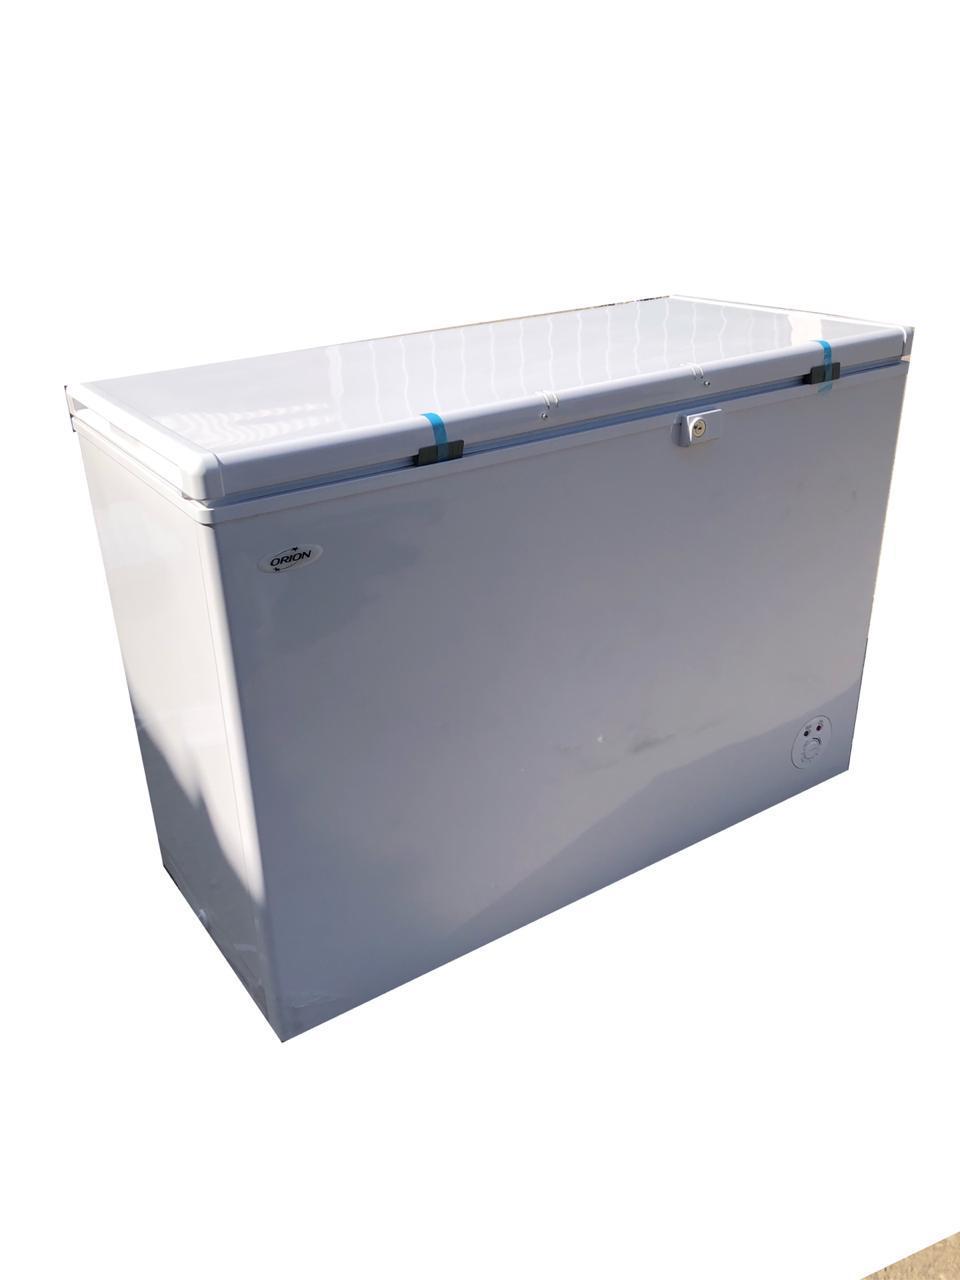 Холодильник-морозильник  ORION  BD-300W сундук (белый)